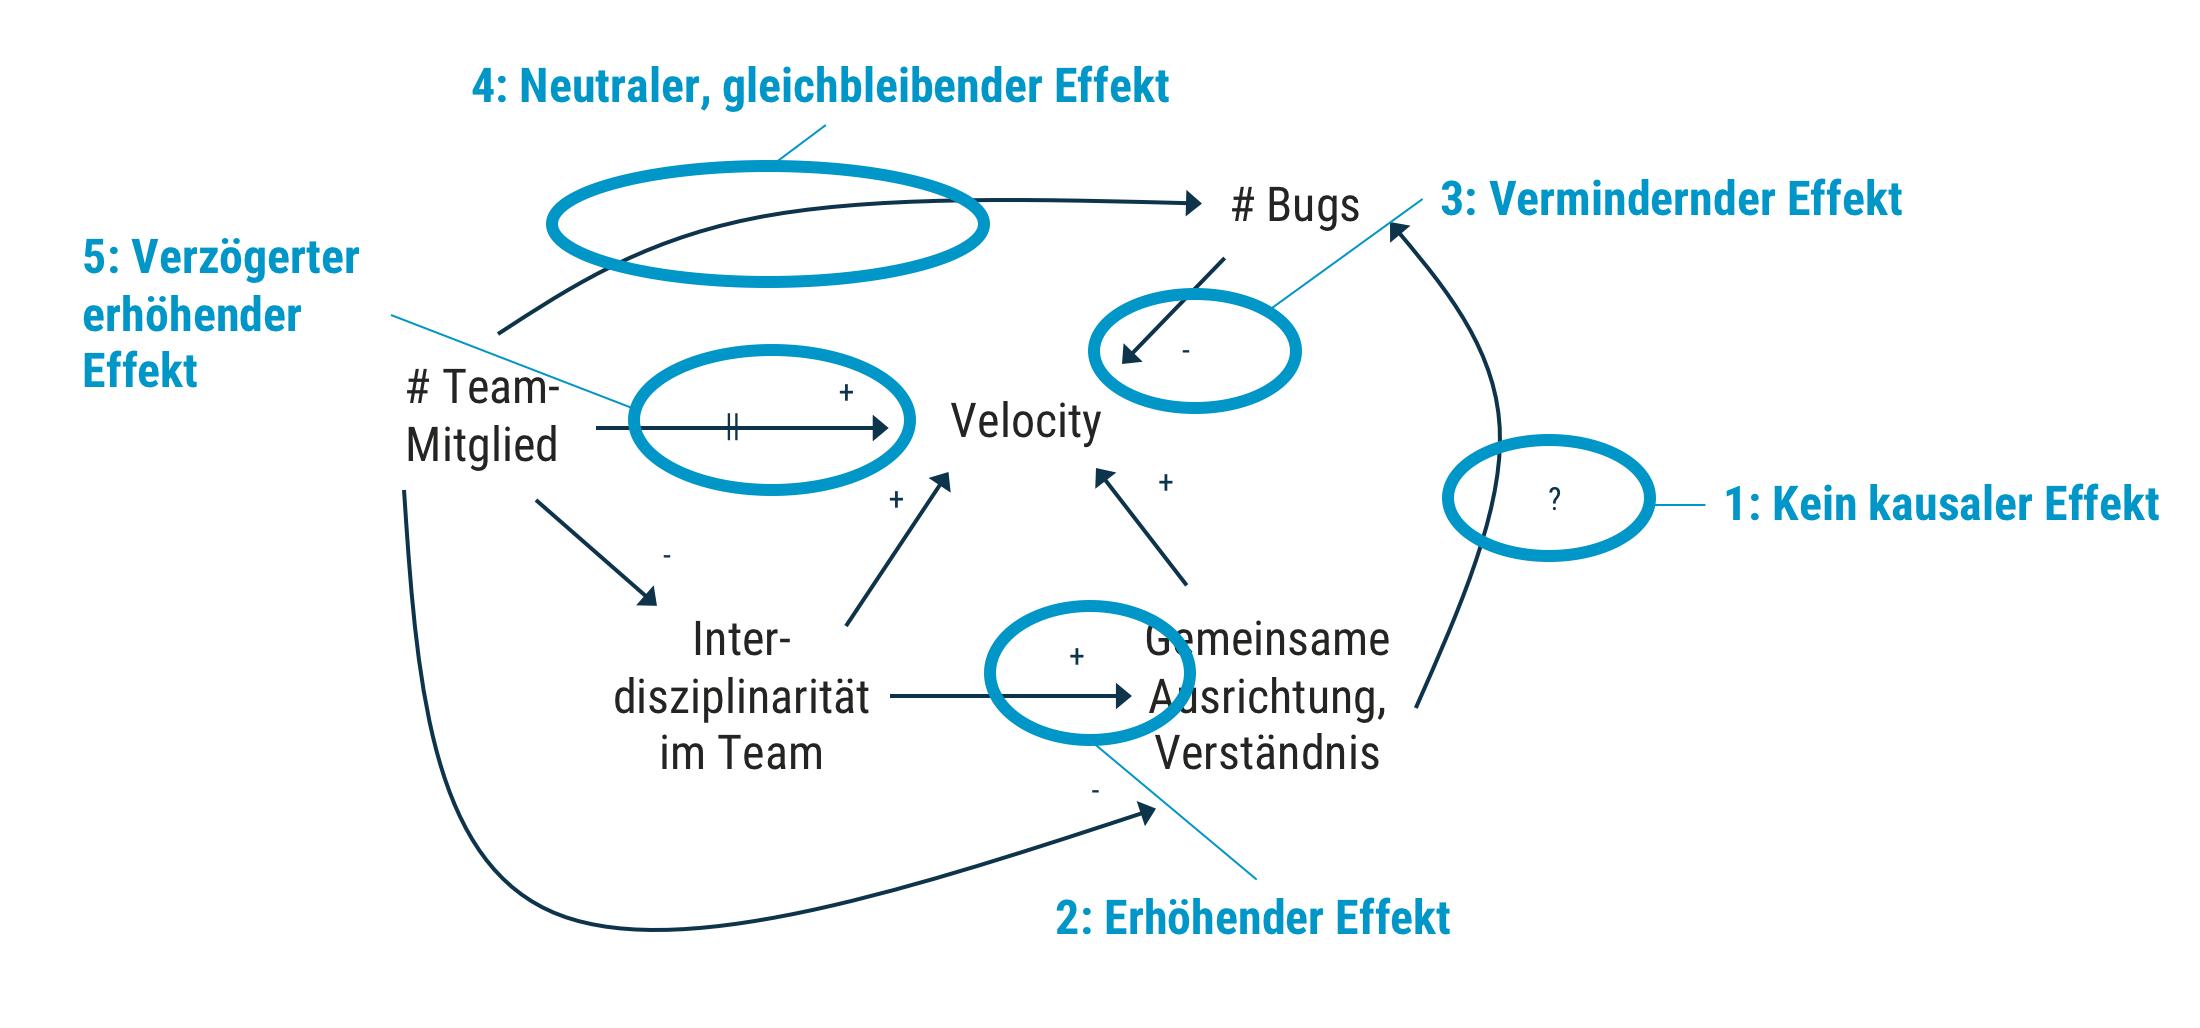 dotag_Blog_Inhalt_Causal_Loop_Diagramm_Notation